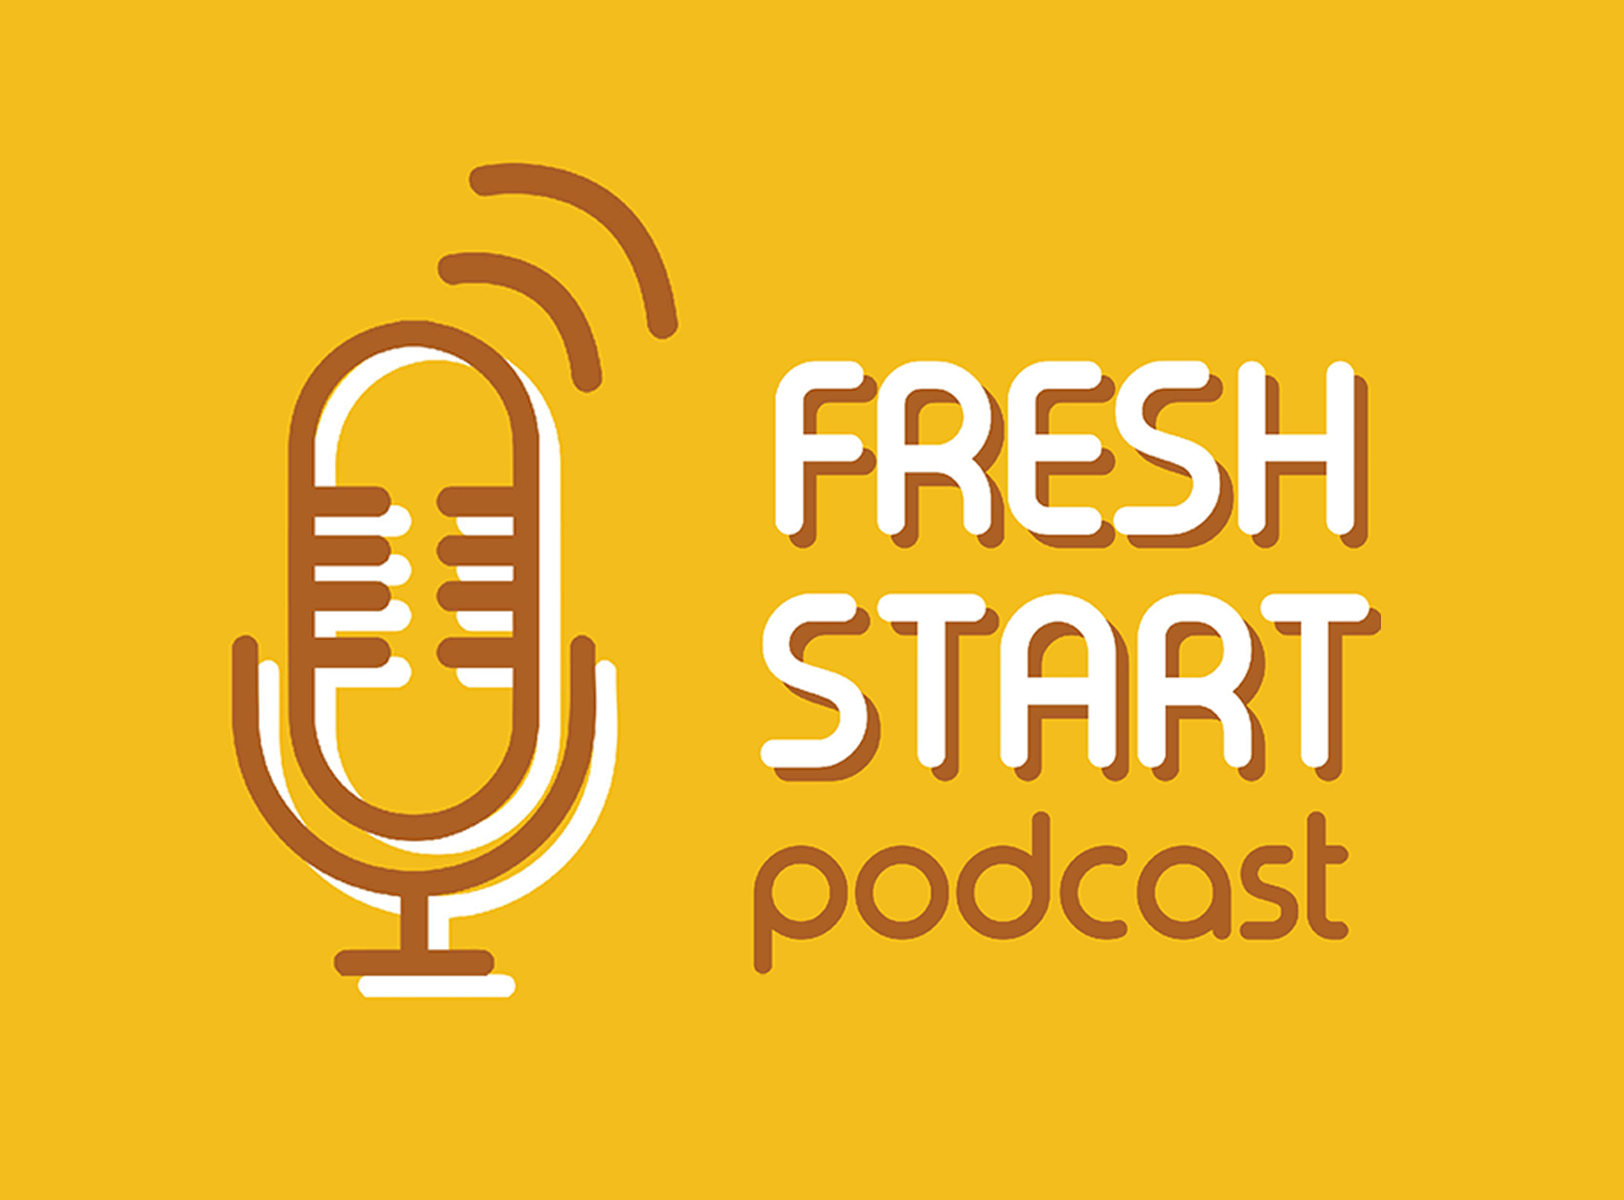 Fresh Start: Podcast News (2/4/2019 Mon.)